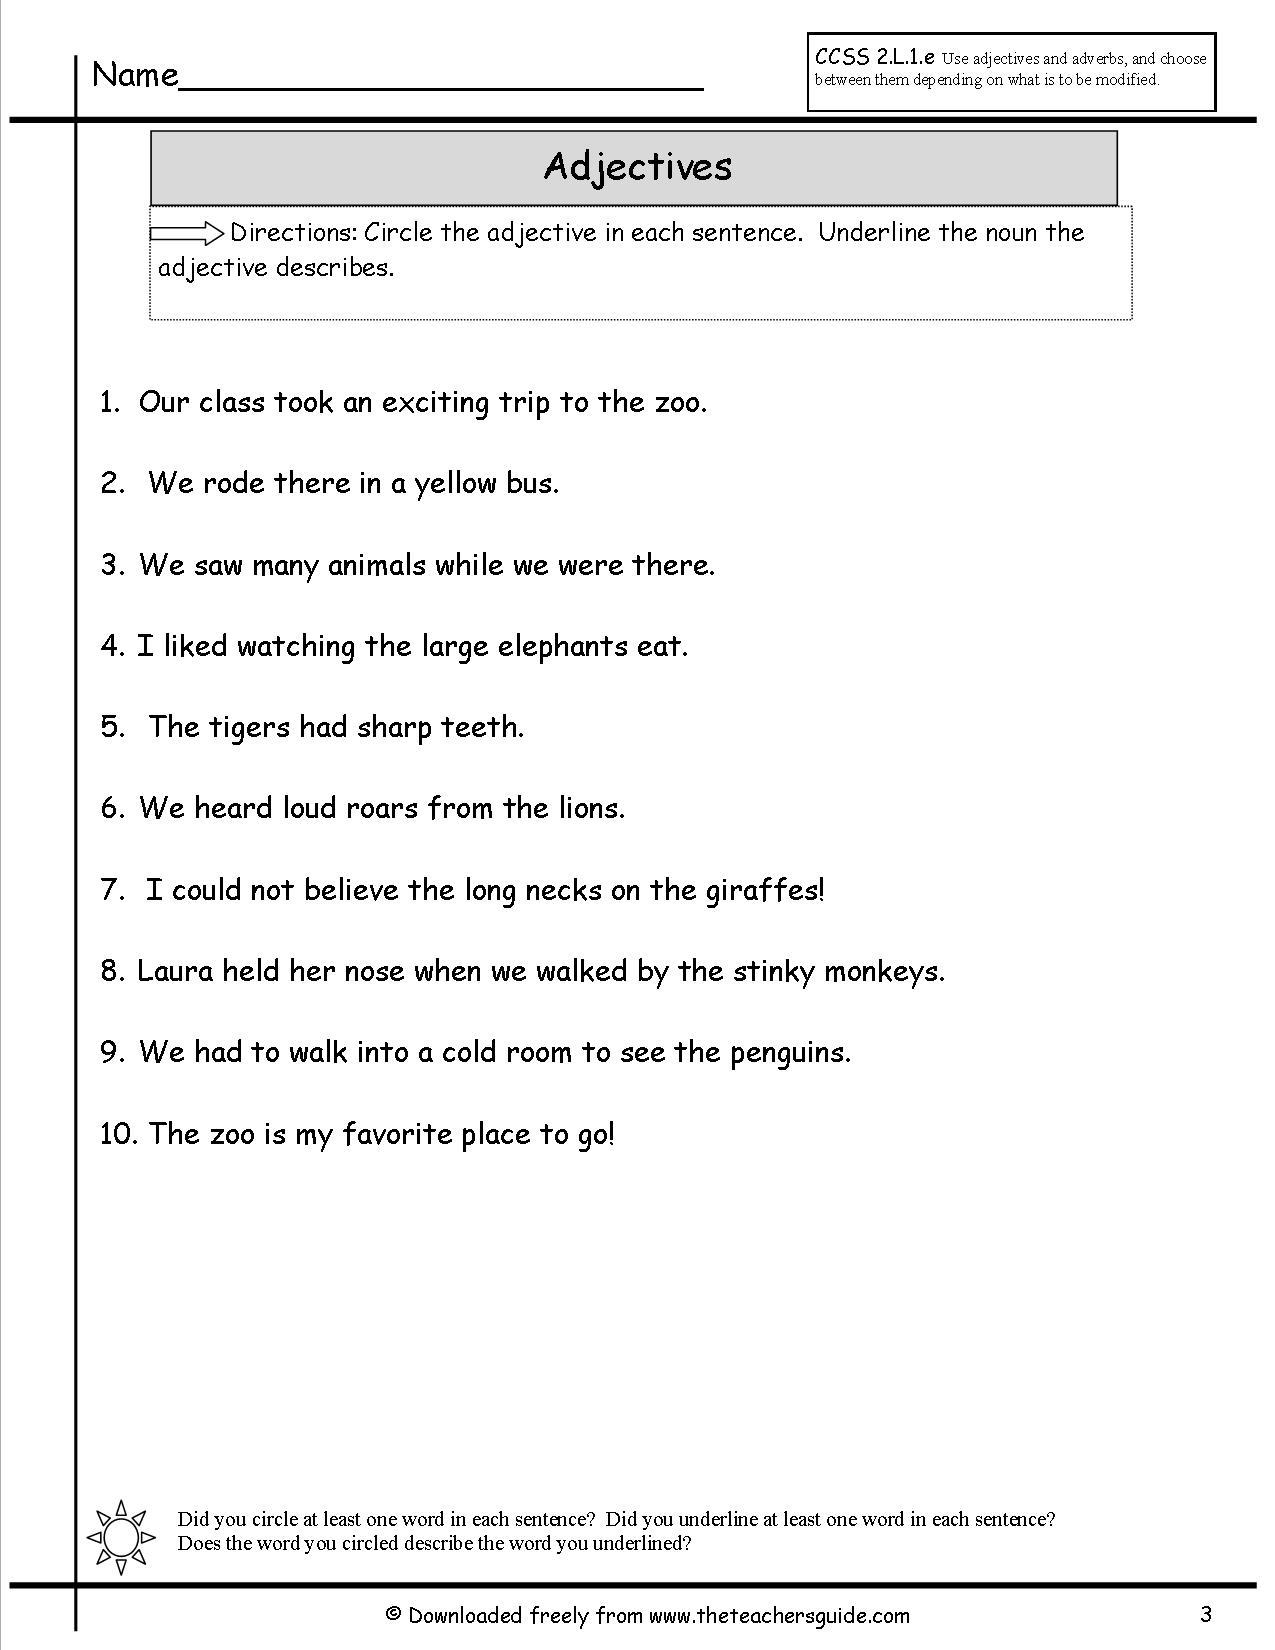 Worksheet Adjectives Homework goconqr english class adjectives 1 ex 4 circle the adjective and underline noun in sentence